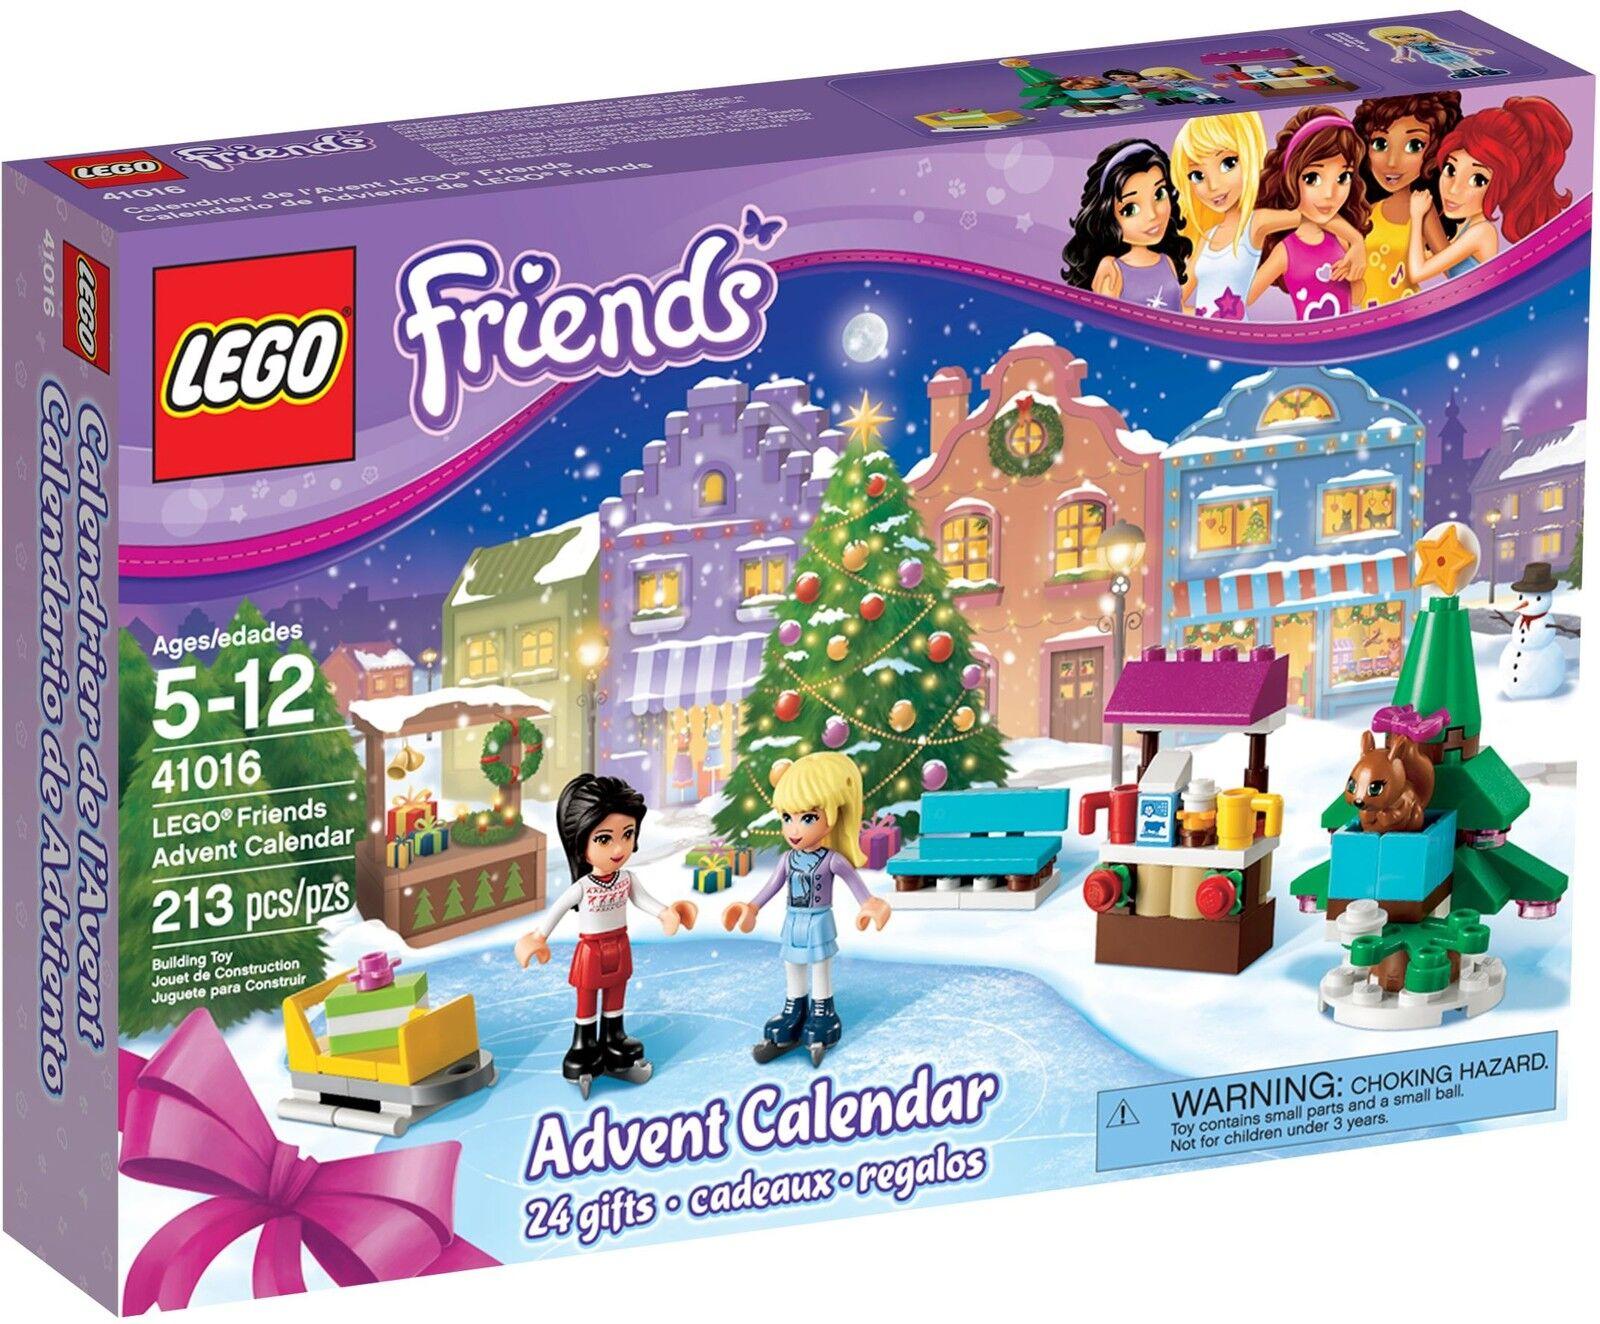 LEGO ® Friends 41016 2013 Advent Calendario NUOVO OVP _ Advent Calendar NEW MISB NRFB